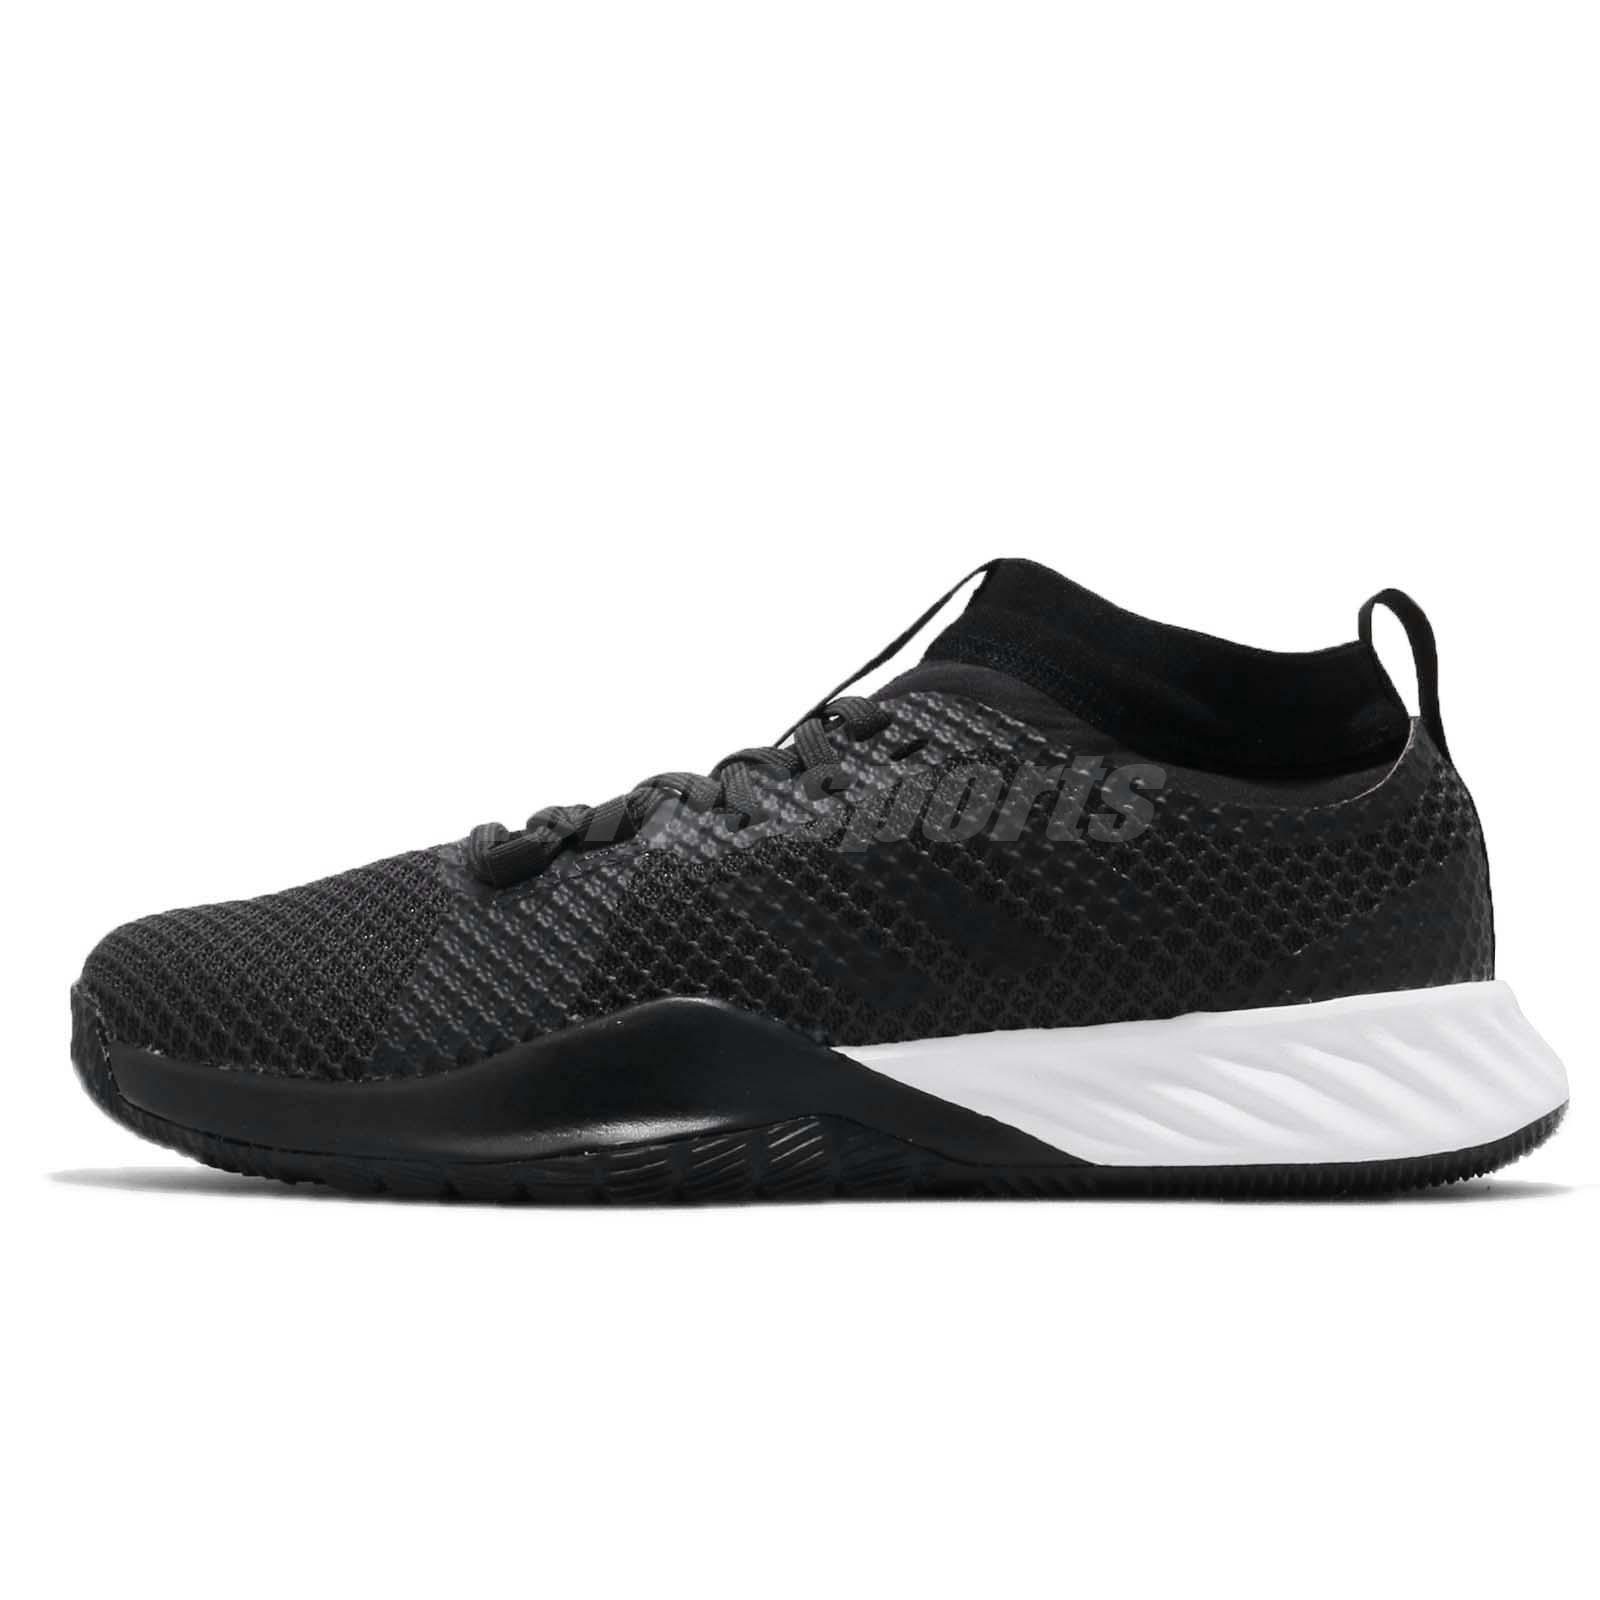 936d66faf6 adidas CrazyTrain Pro 3.0 M Black White Men Cross Training Shoes Trainers  CG3472